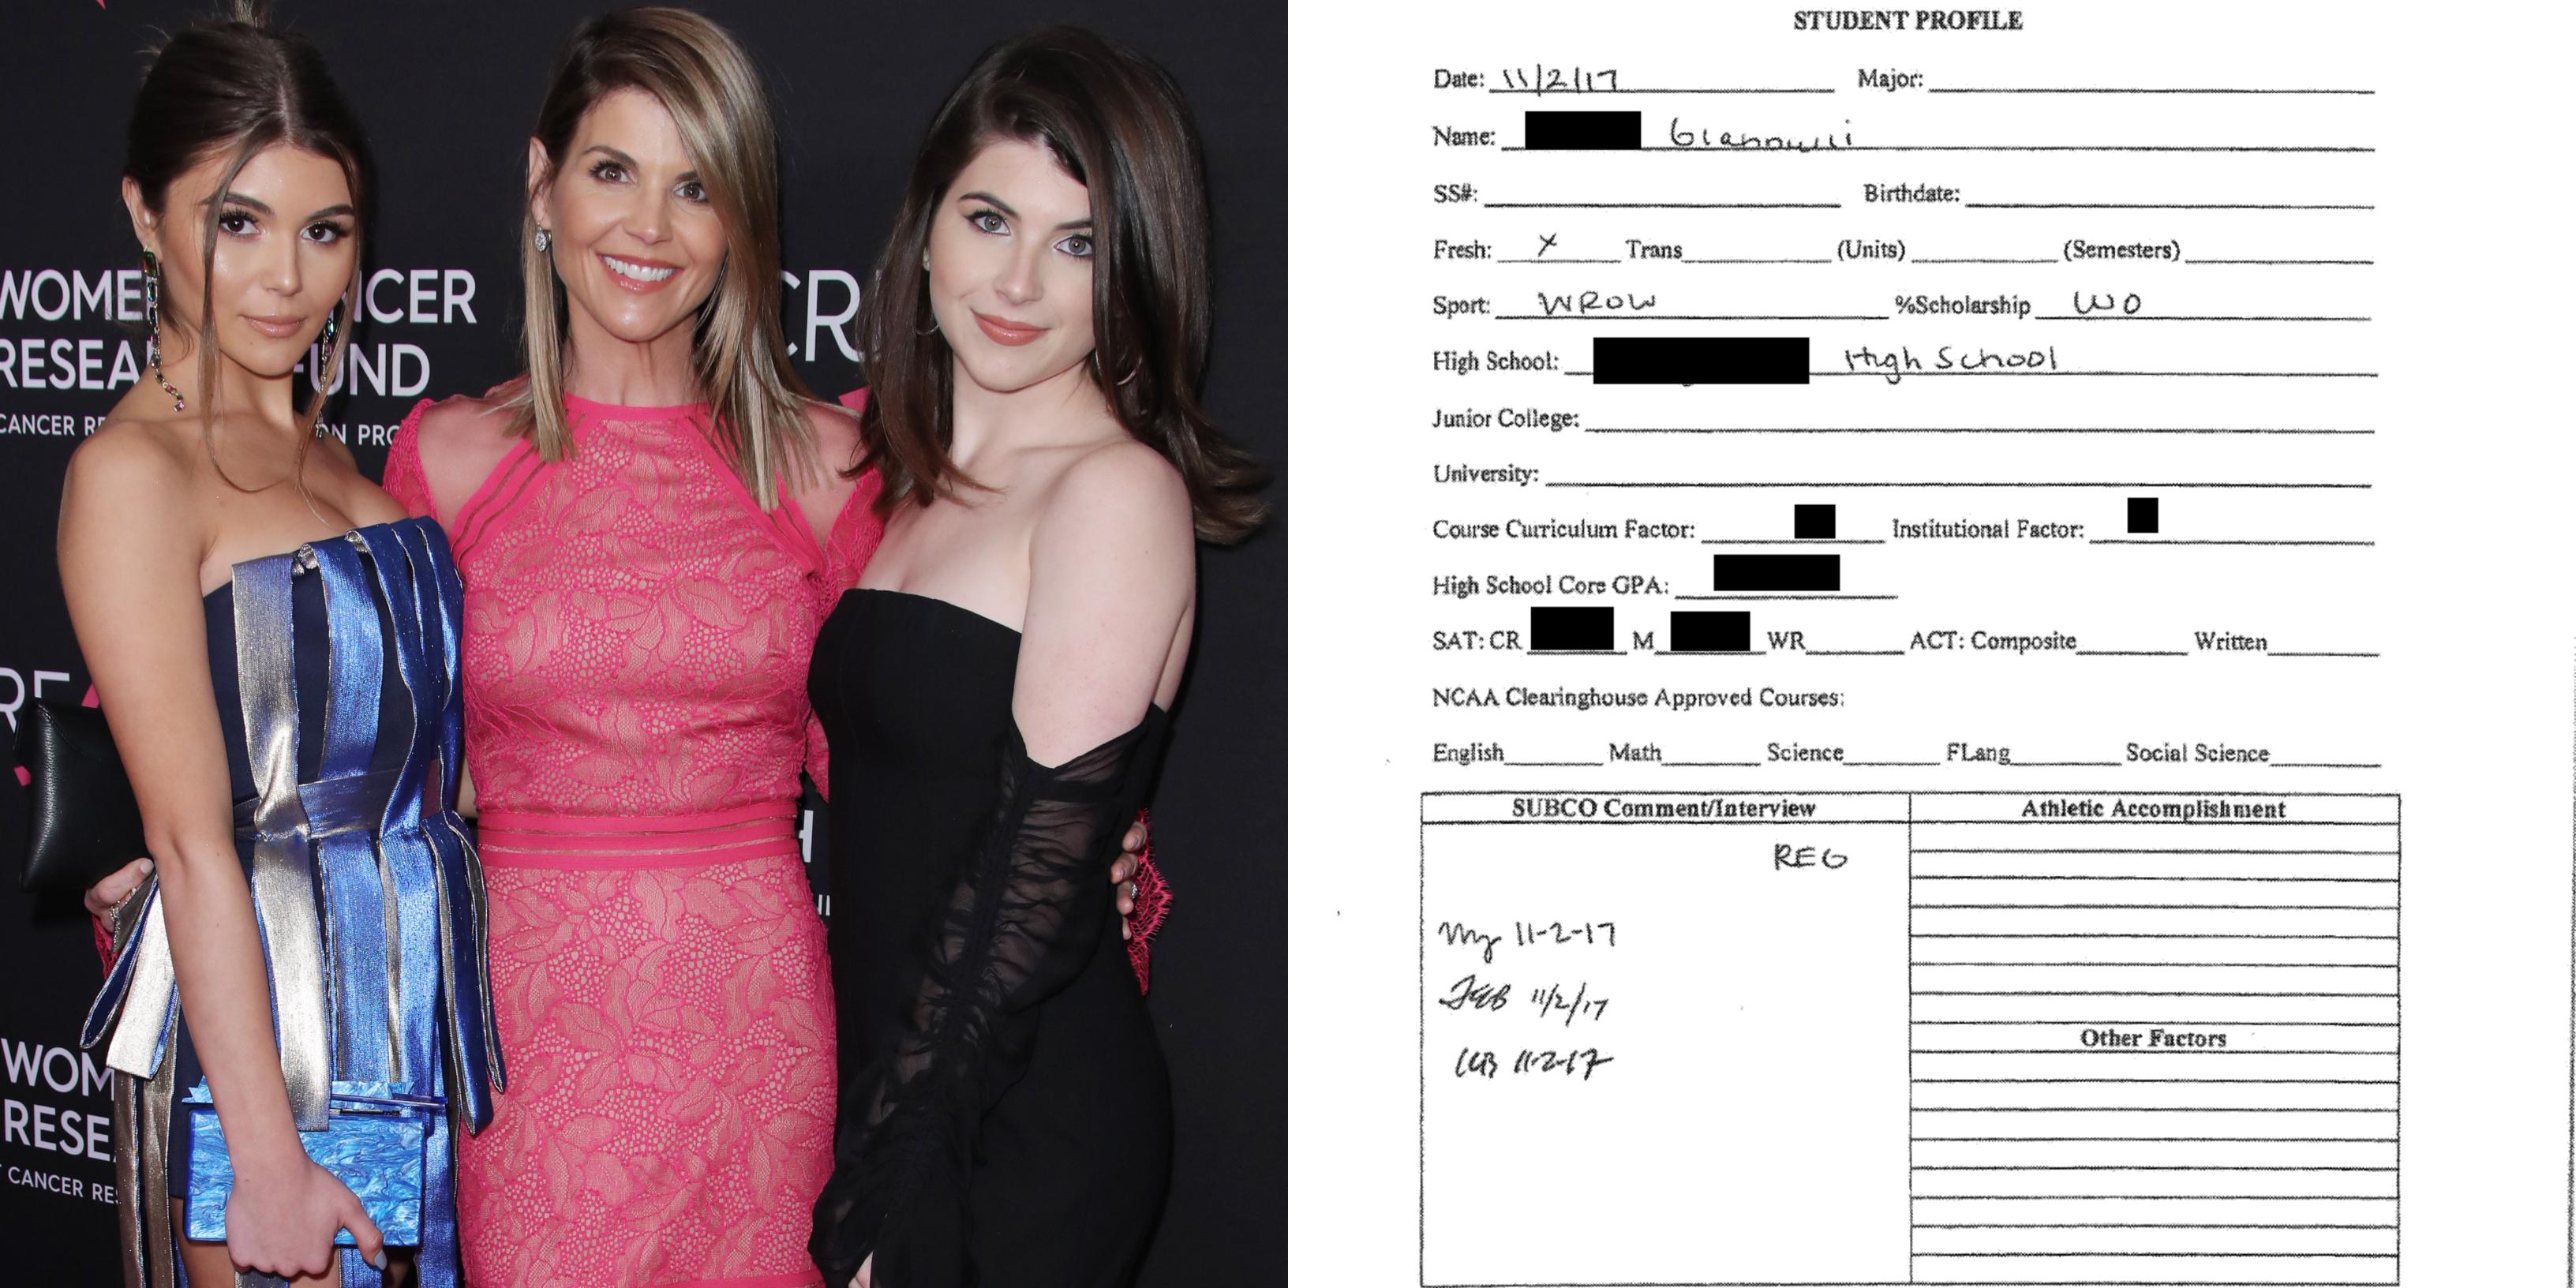 Lori Loughlin's Daughter's Fake Resume Released in College Scandal